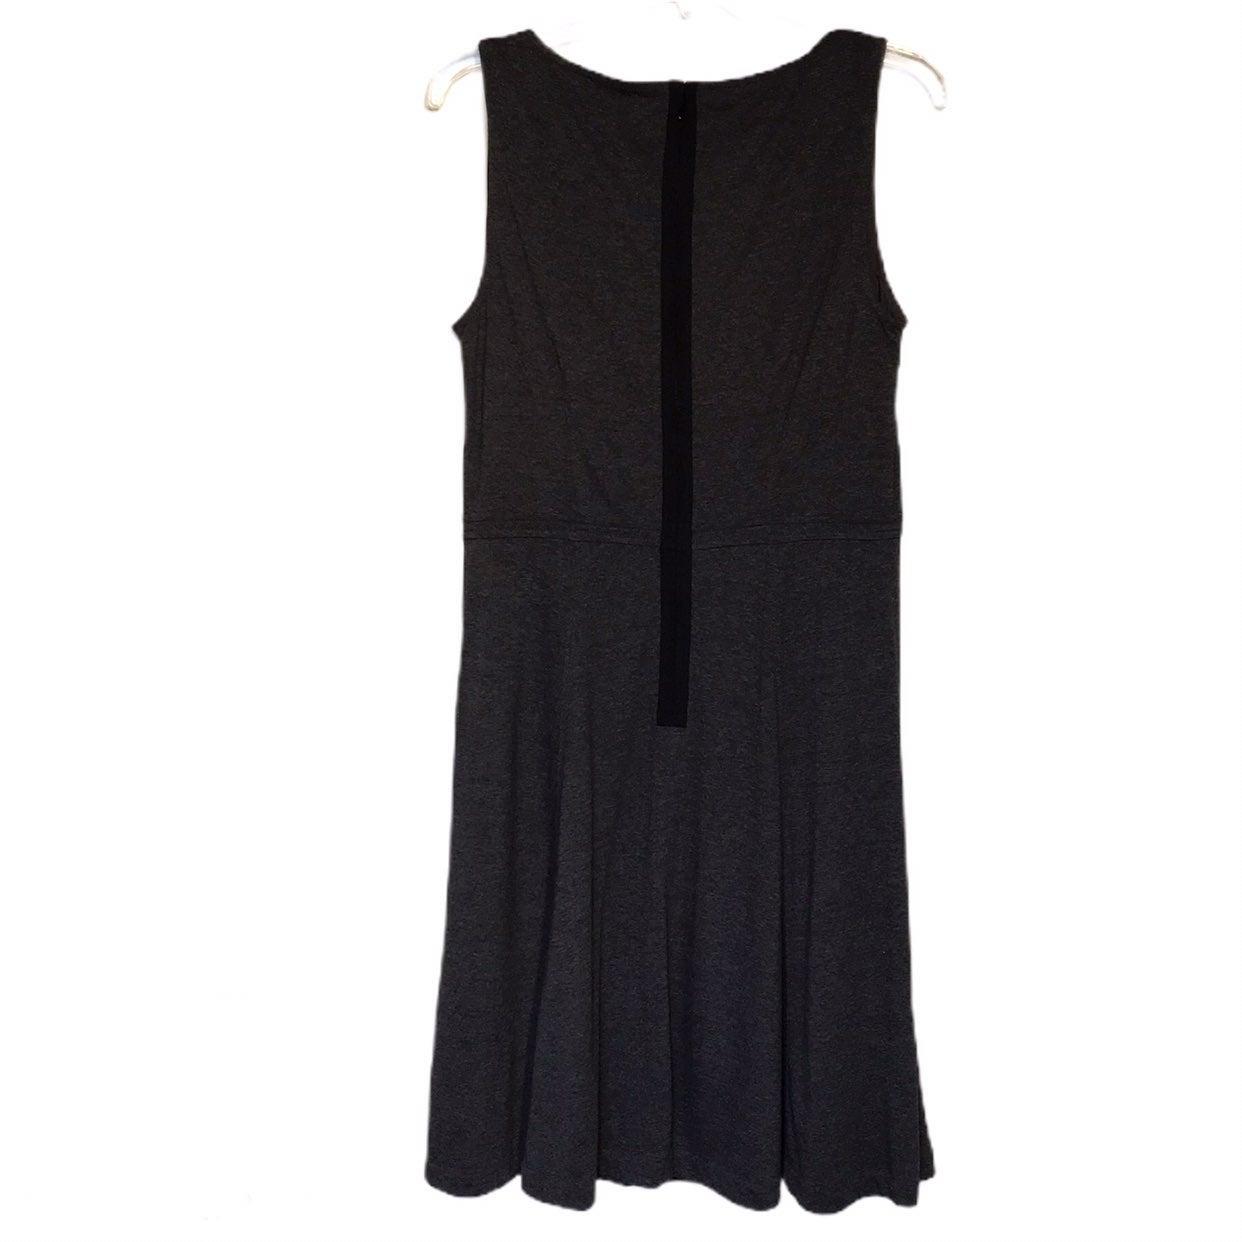 Loft Gray Knit Exposed Zipper Midi Dress